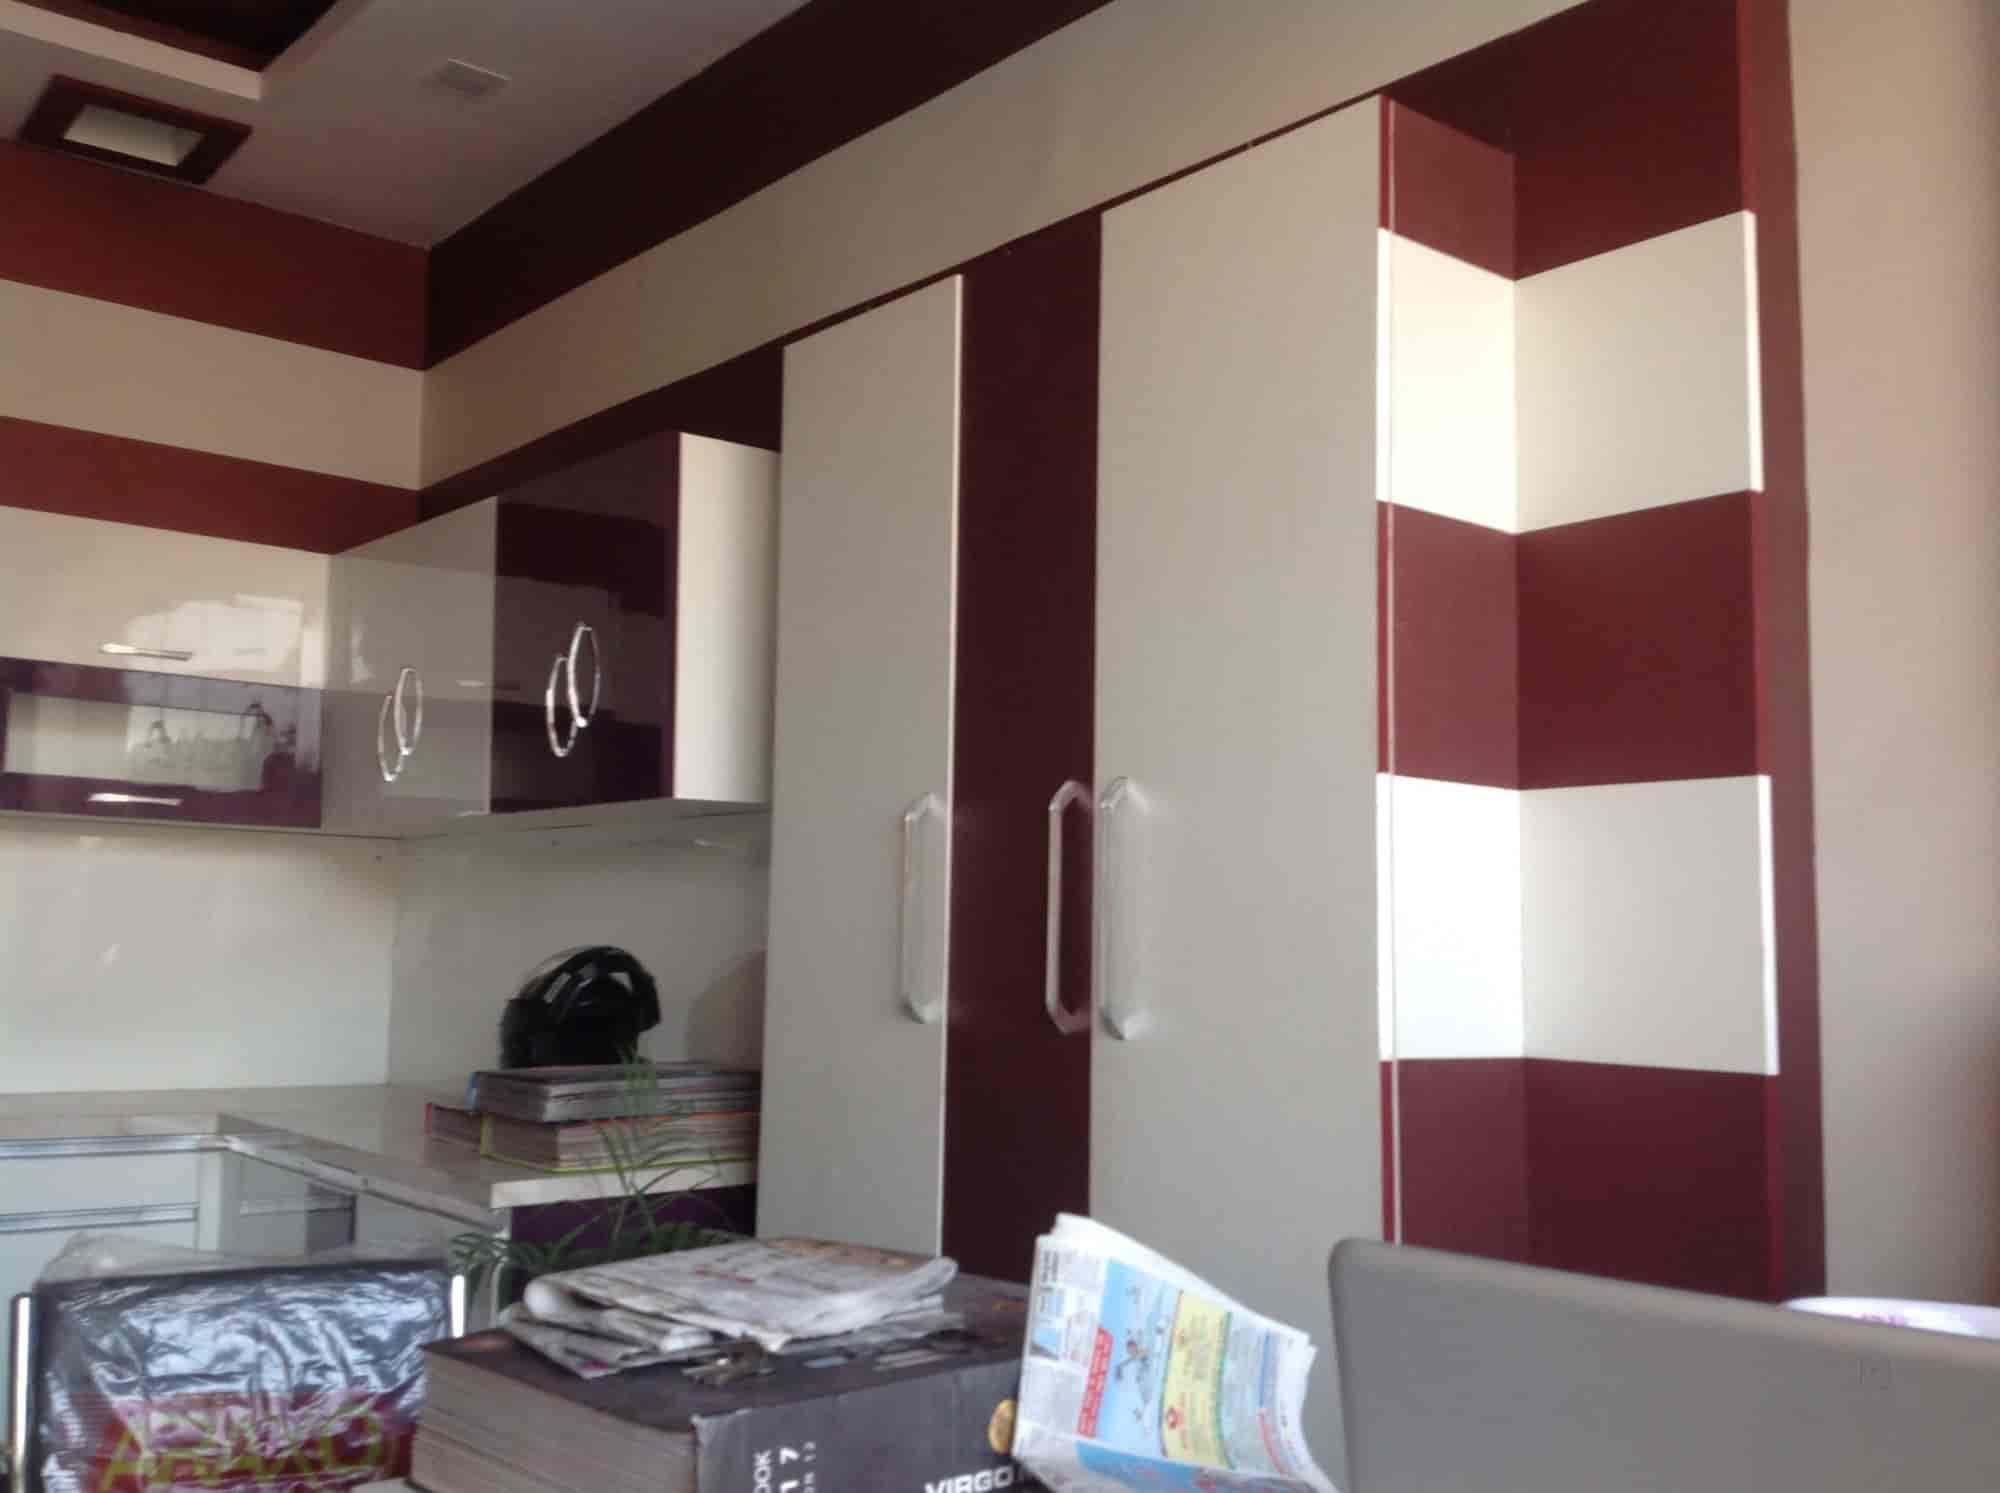 Hitech Interior Modular Kitchen Photos Izzat Nagar Bareilly